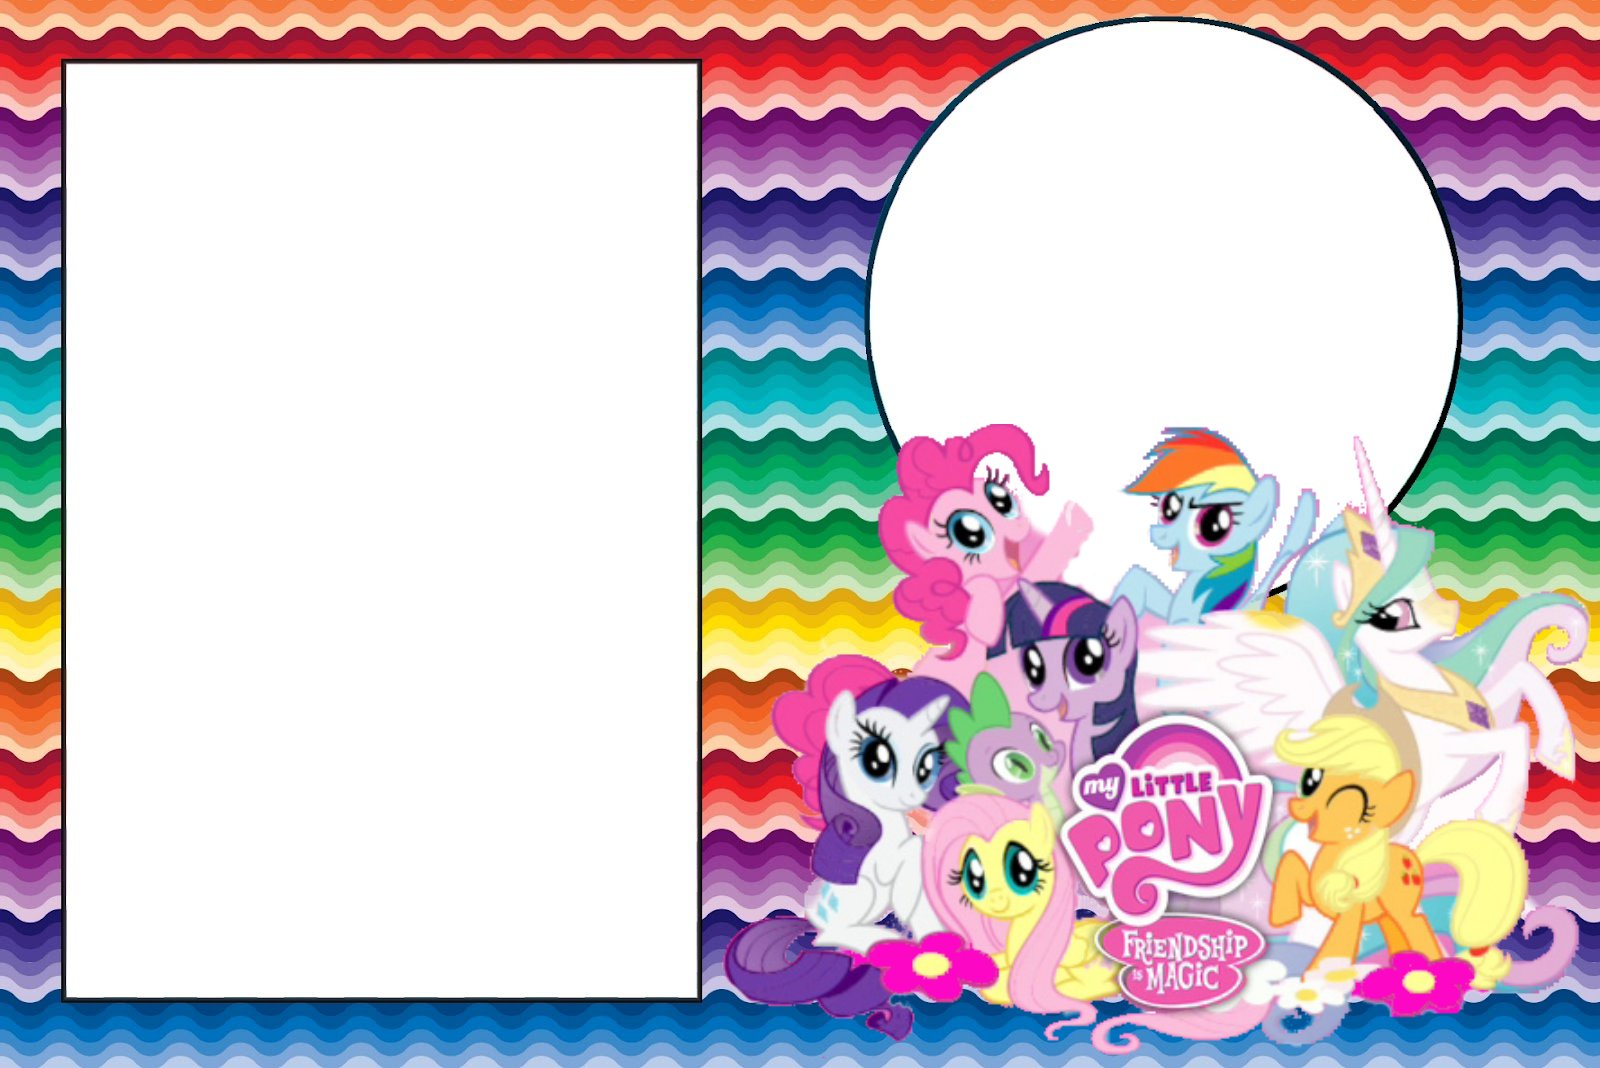 Invitaciones gratis para imprimir de My Little Pony - Imagui